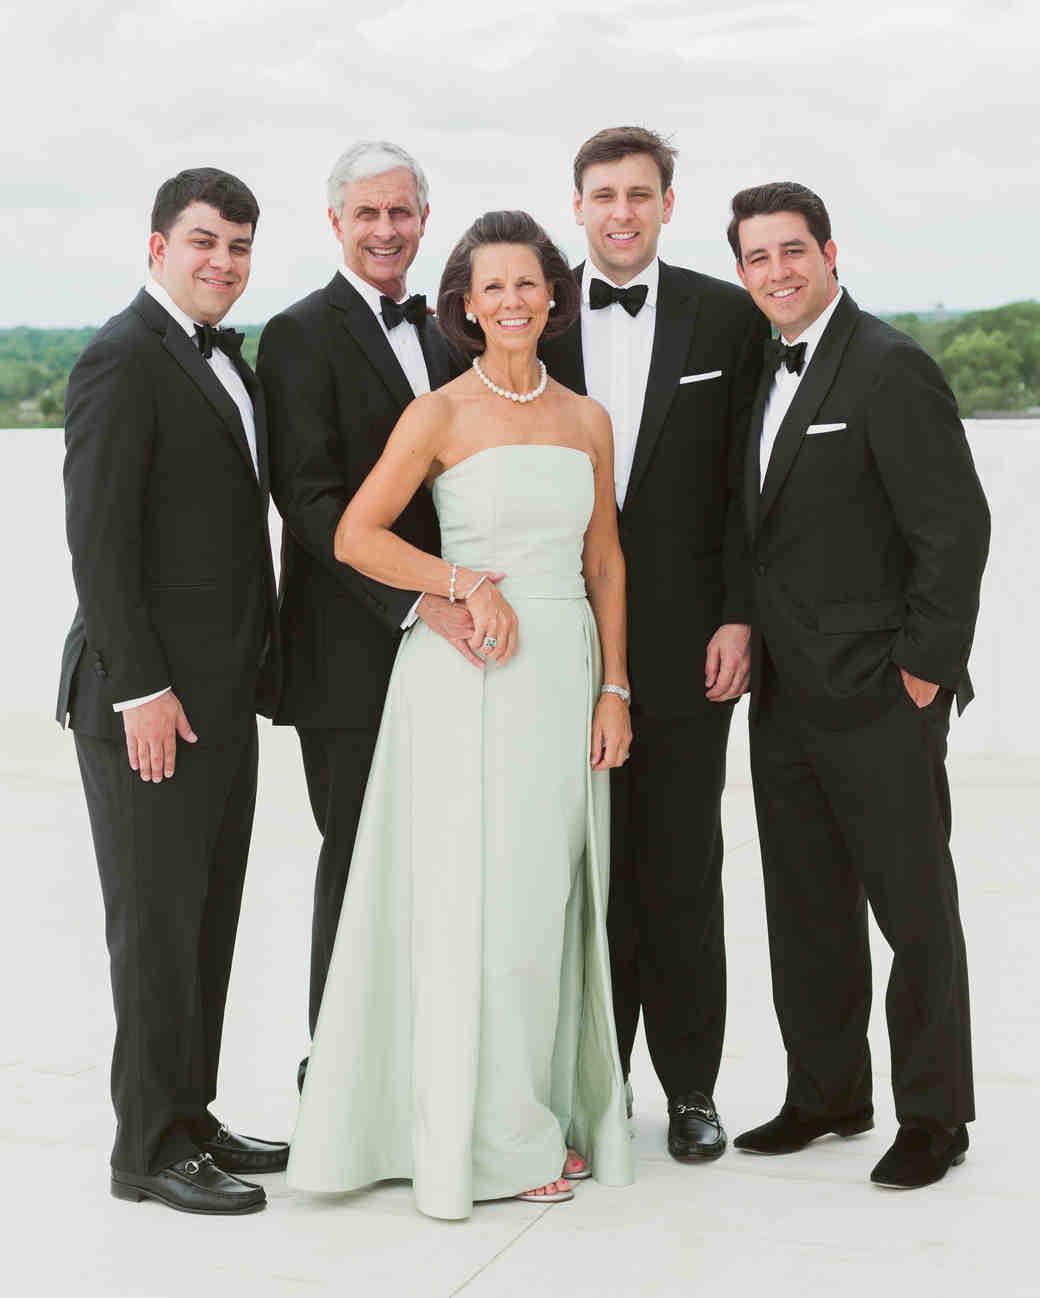 Brooke and David's wedding - Family